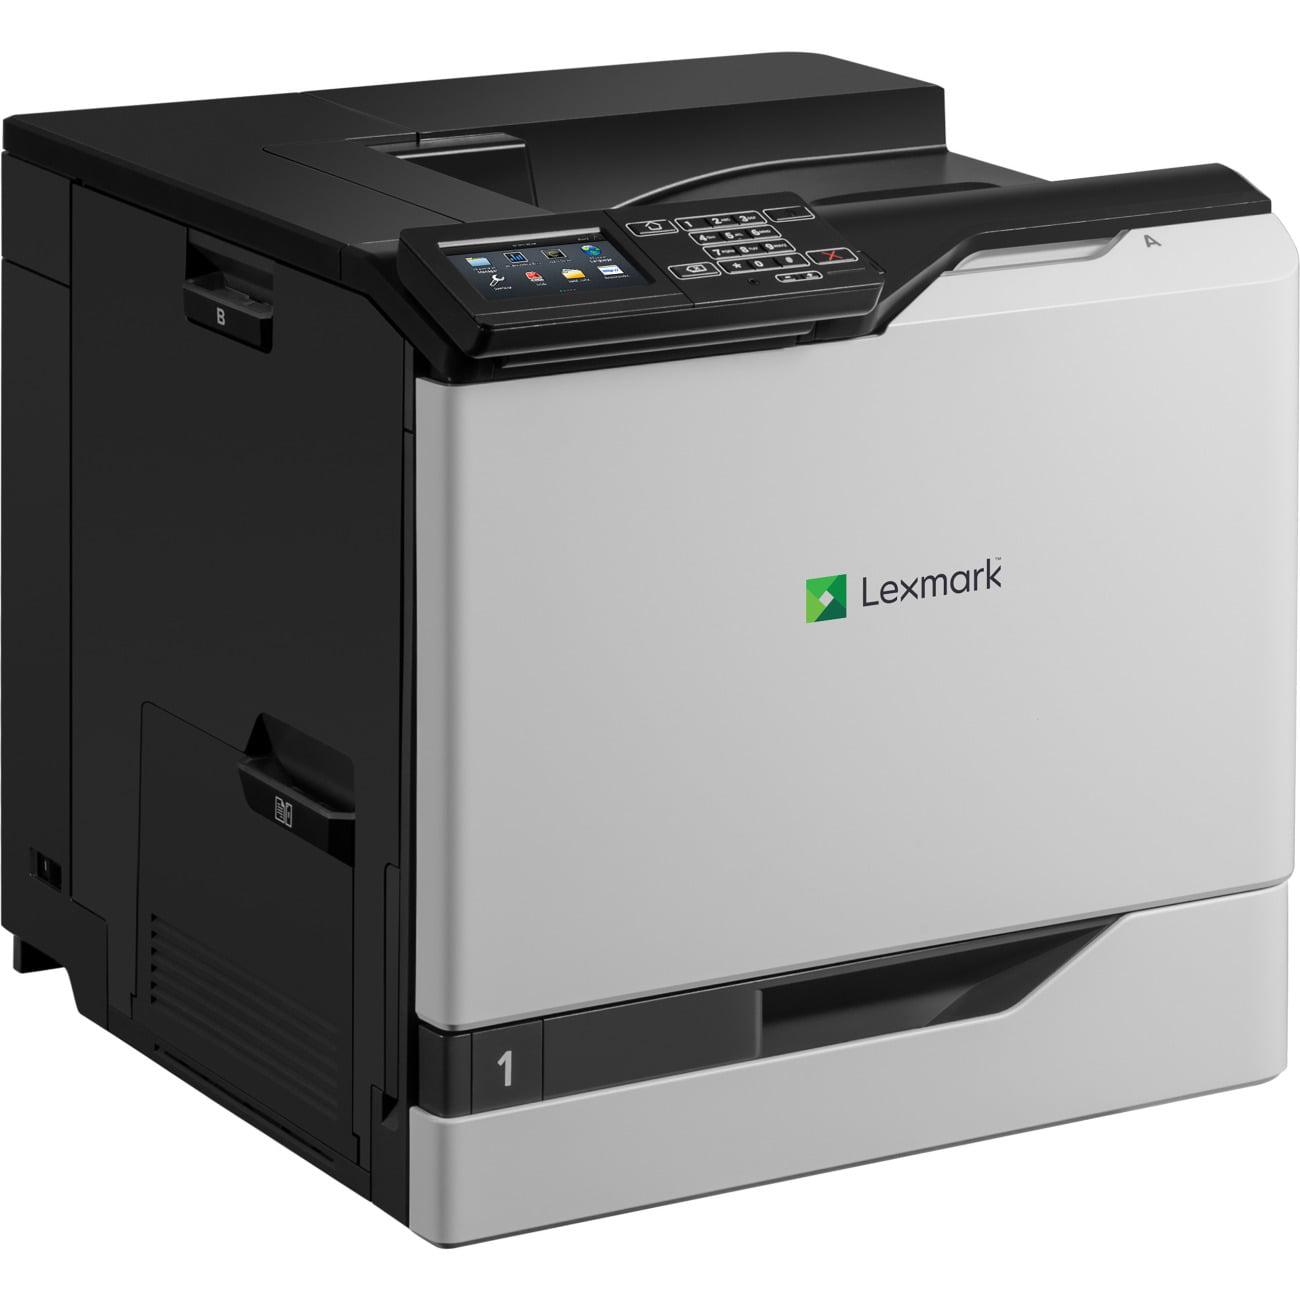 Lexmark Printers 21KT002 CS820DE TAA Compliant Color Laser Printer